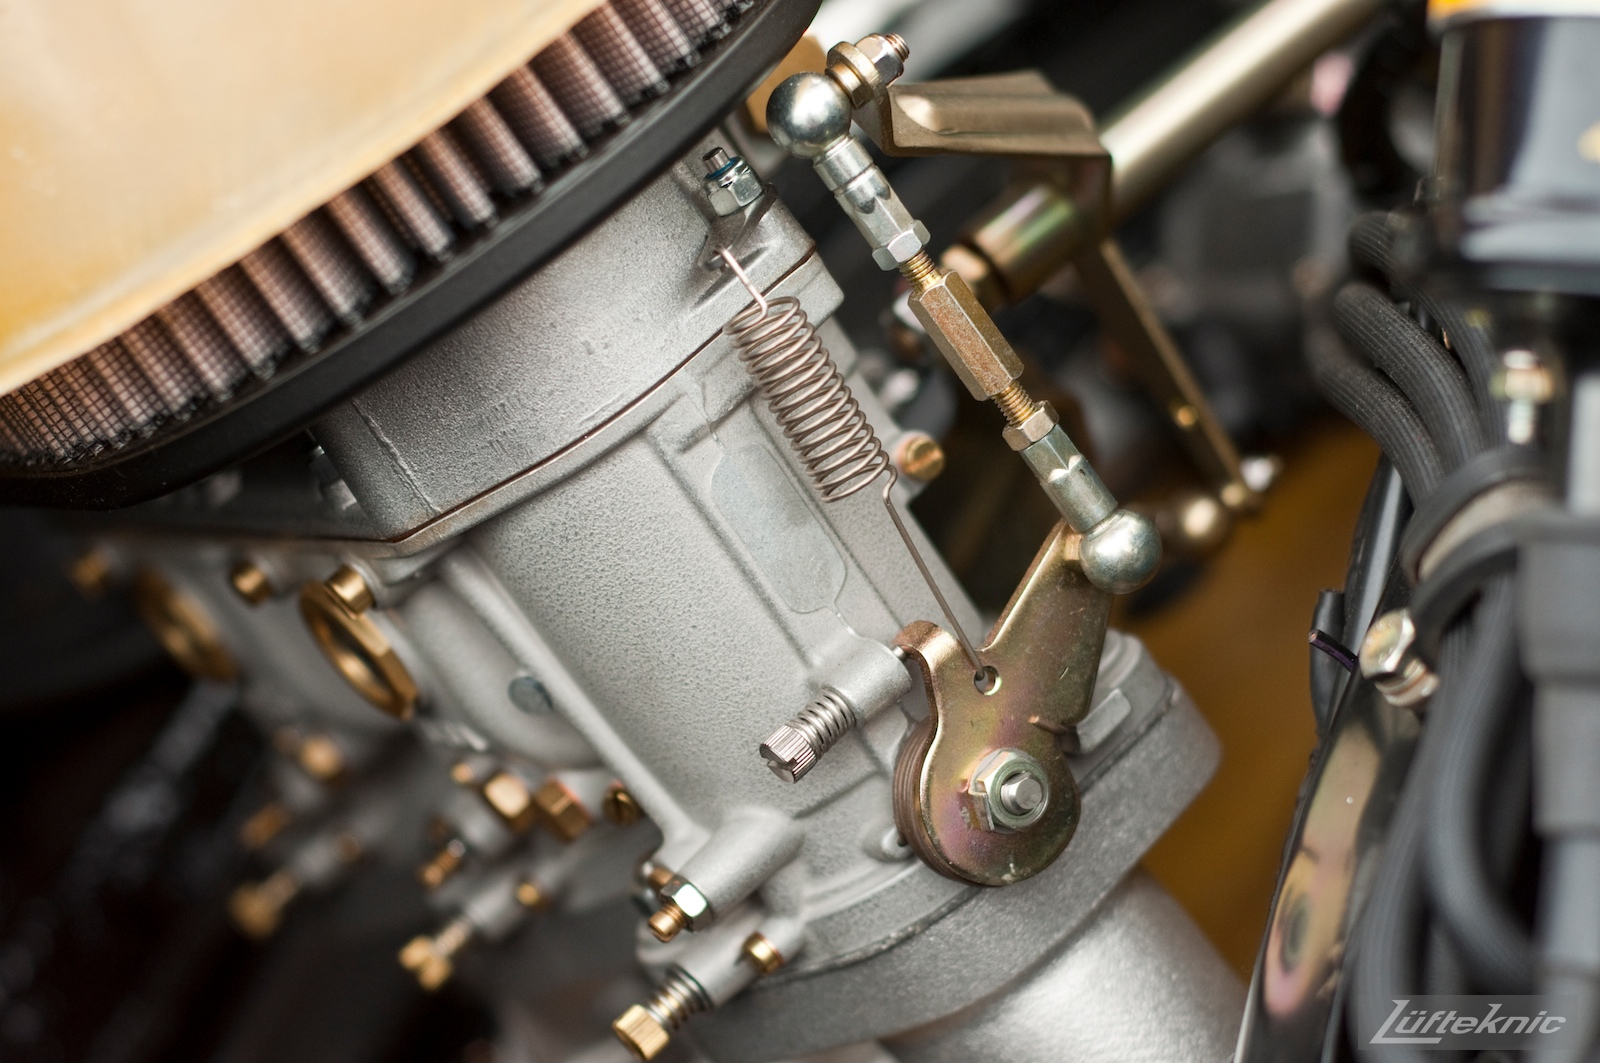 Carburetor linkage.